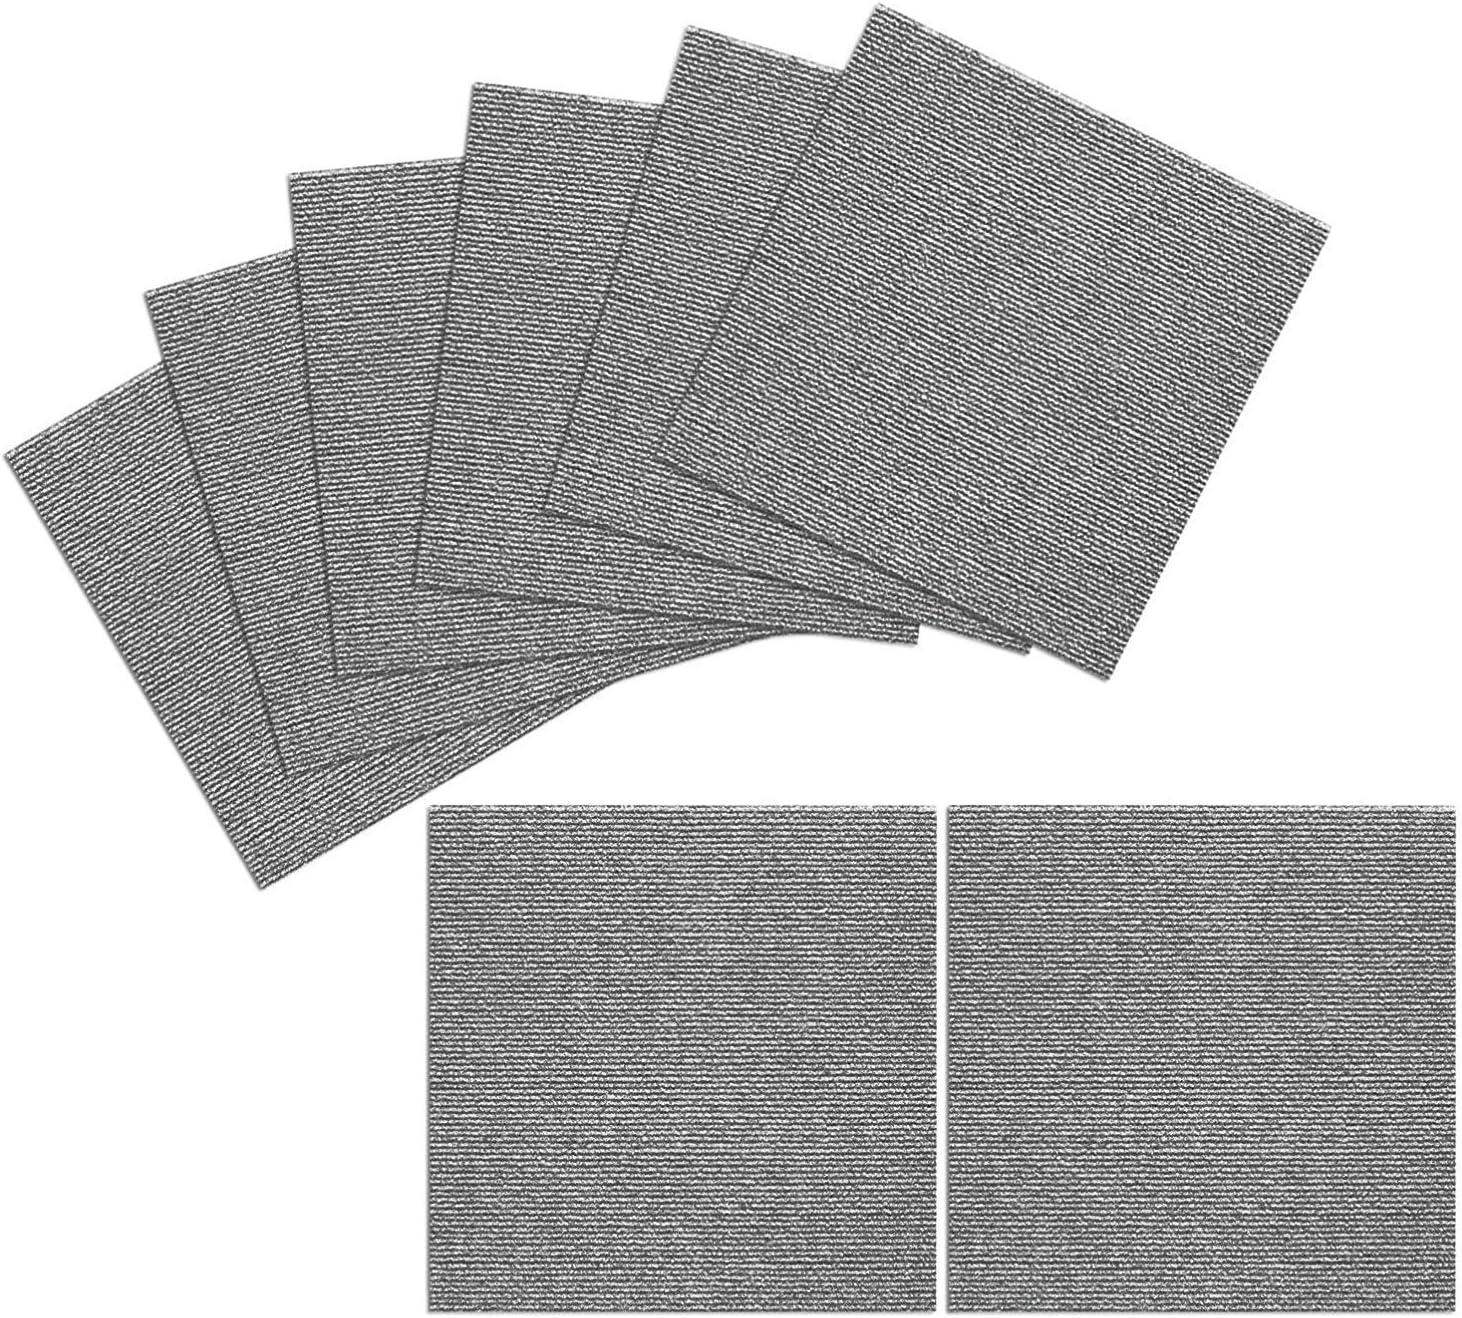 TRILUC Peel and Stick Carpet Tile Squares – Machine Washable, Non-Slip, Water Repellent Tile Mats – 12 x 12 x .13 - Pack of 8, Gray